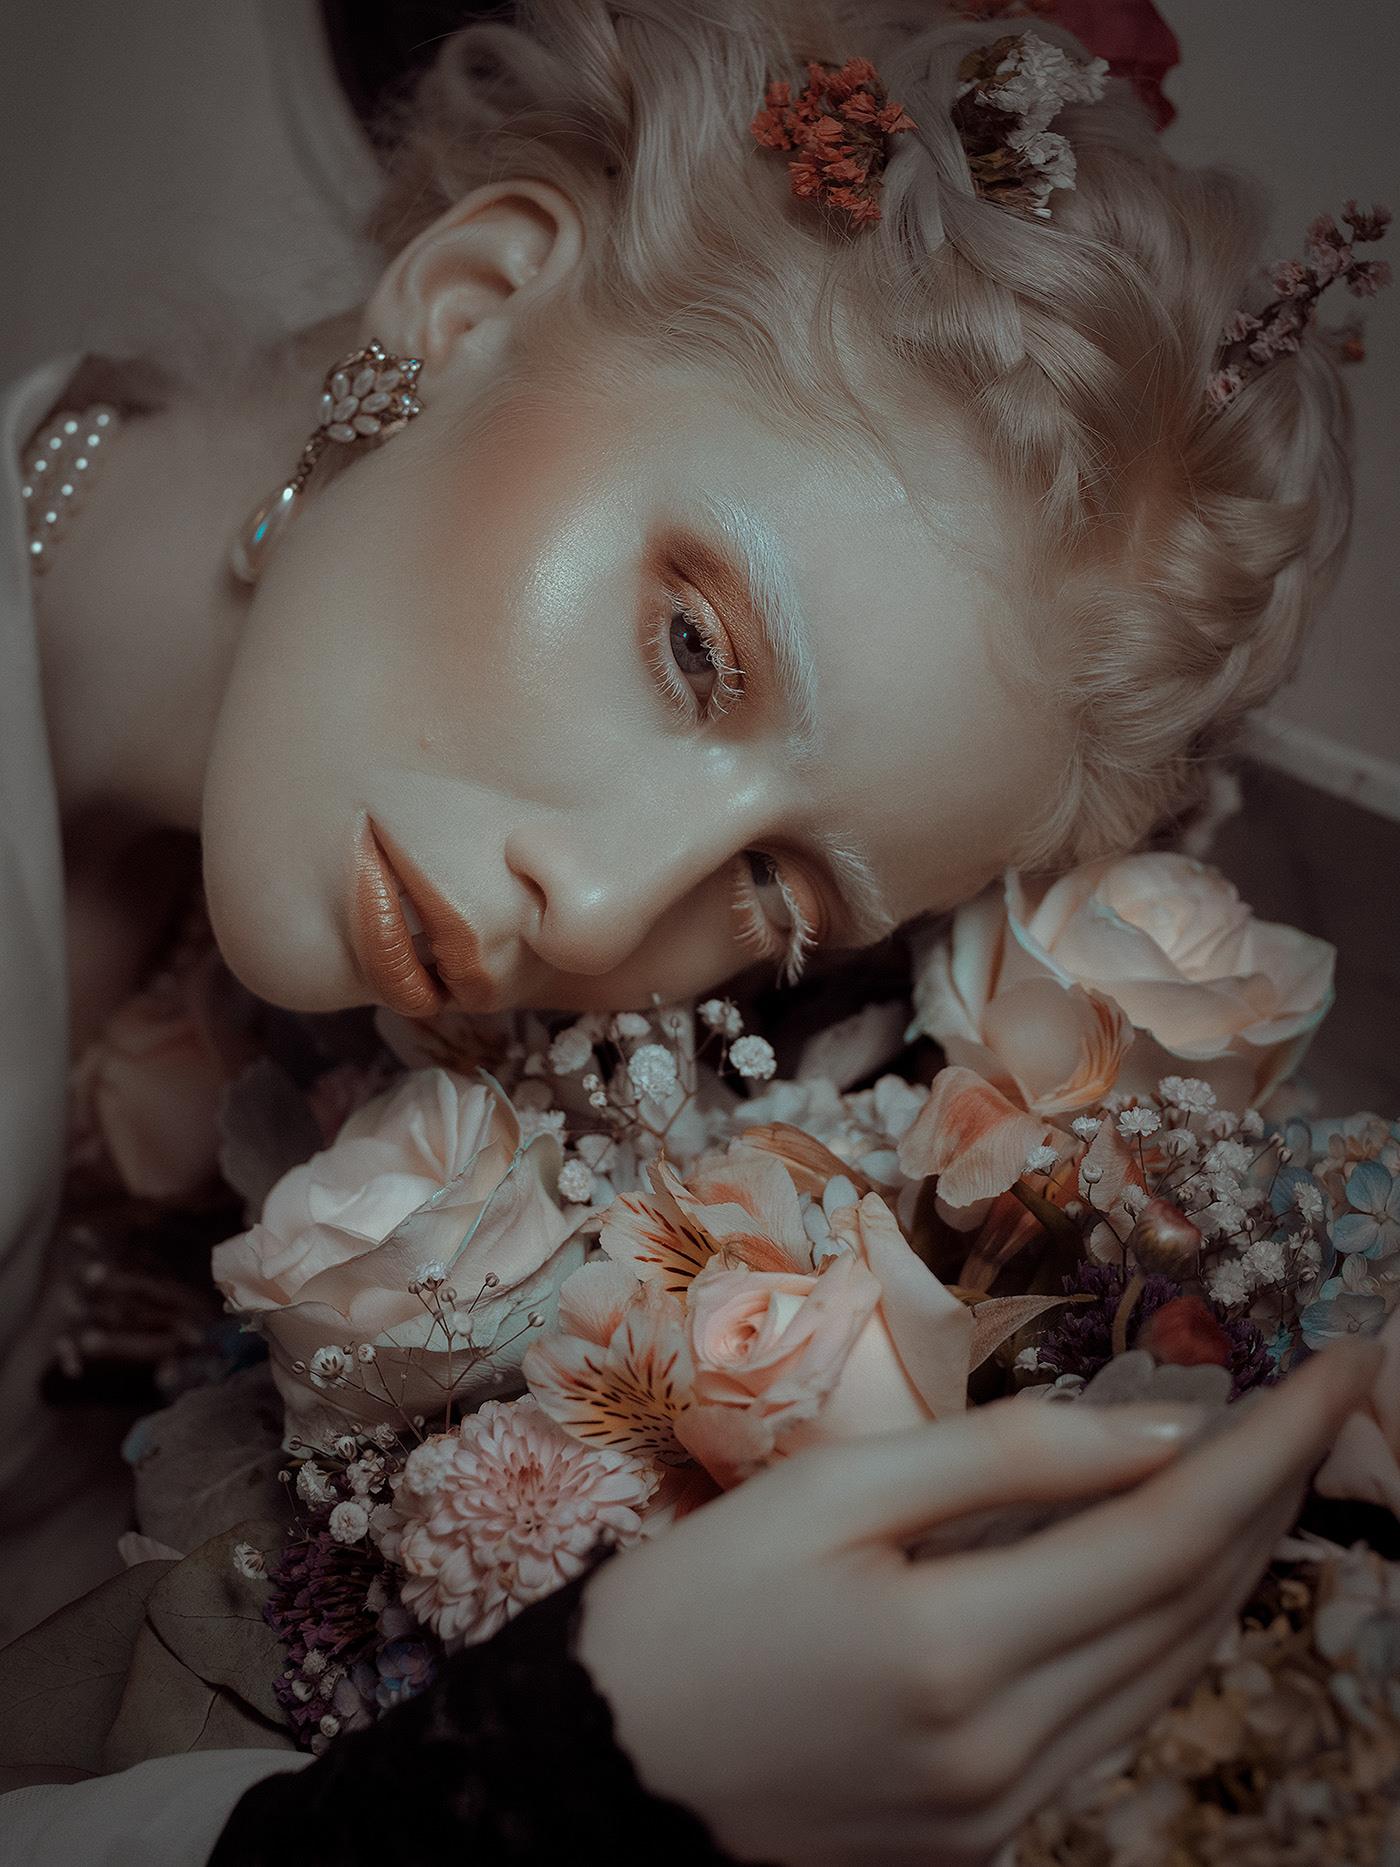 Pale lady / фотограф Rebeca Saray